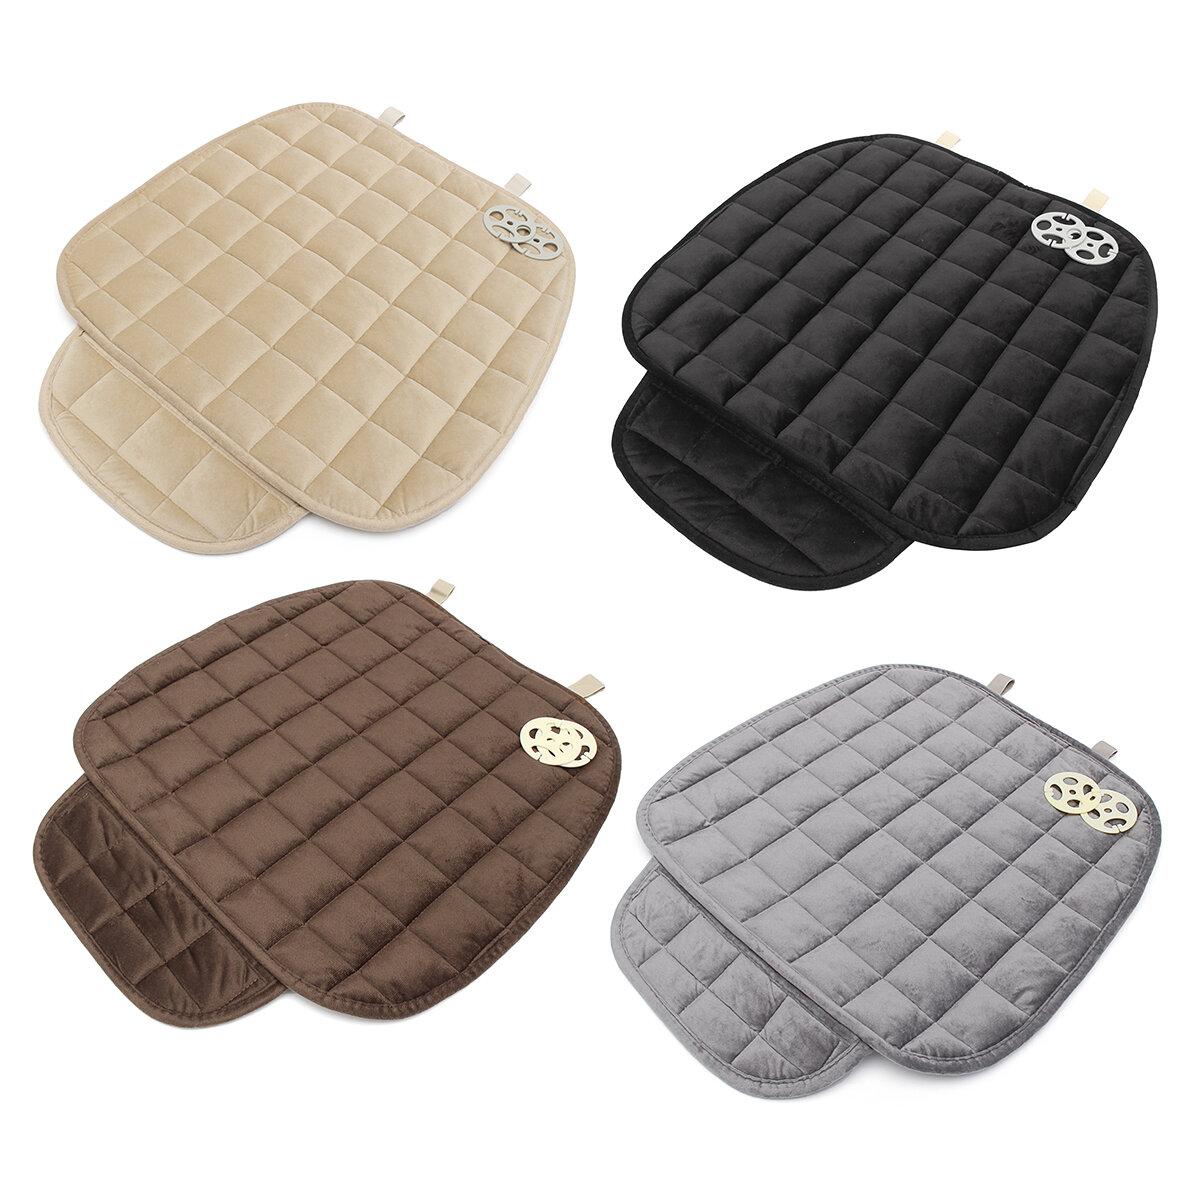 Universal Square Wistiti Sponge Front Row Car Seat Cover Small Mat Auto Chair Cushion